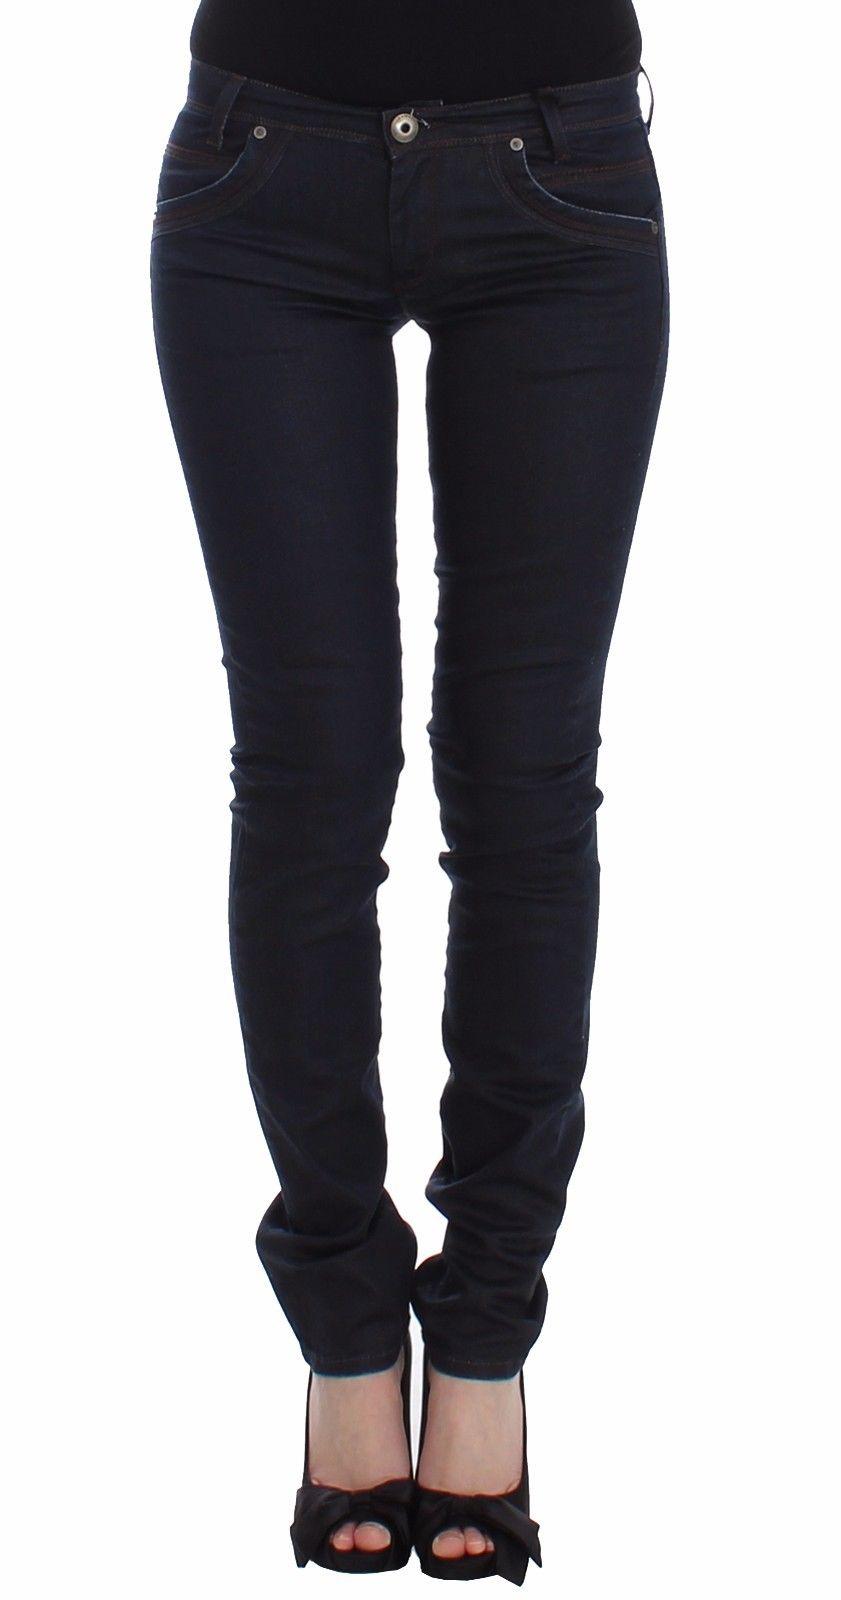 Ermanno Scervino Women's Skinny Leg Jeans Blue SIG12471 - W26